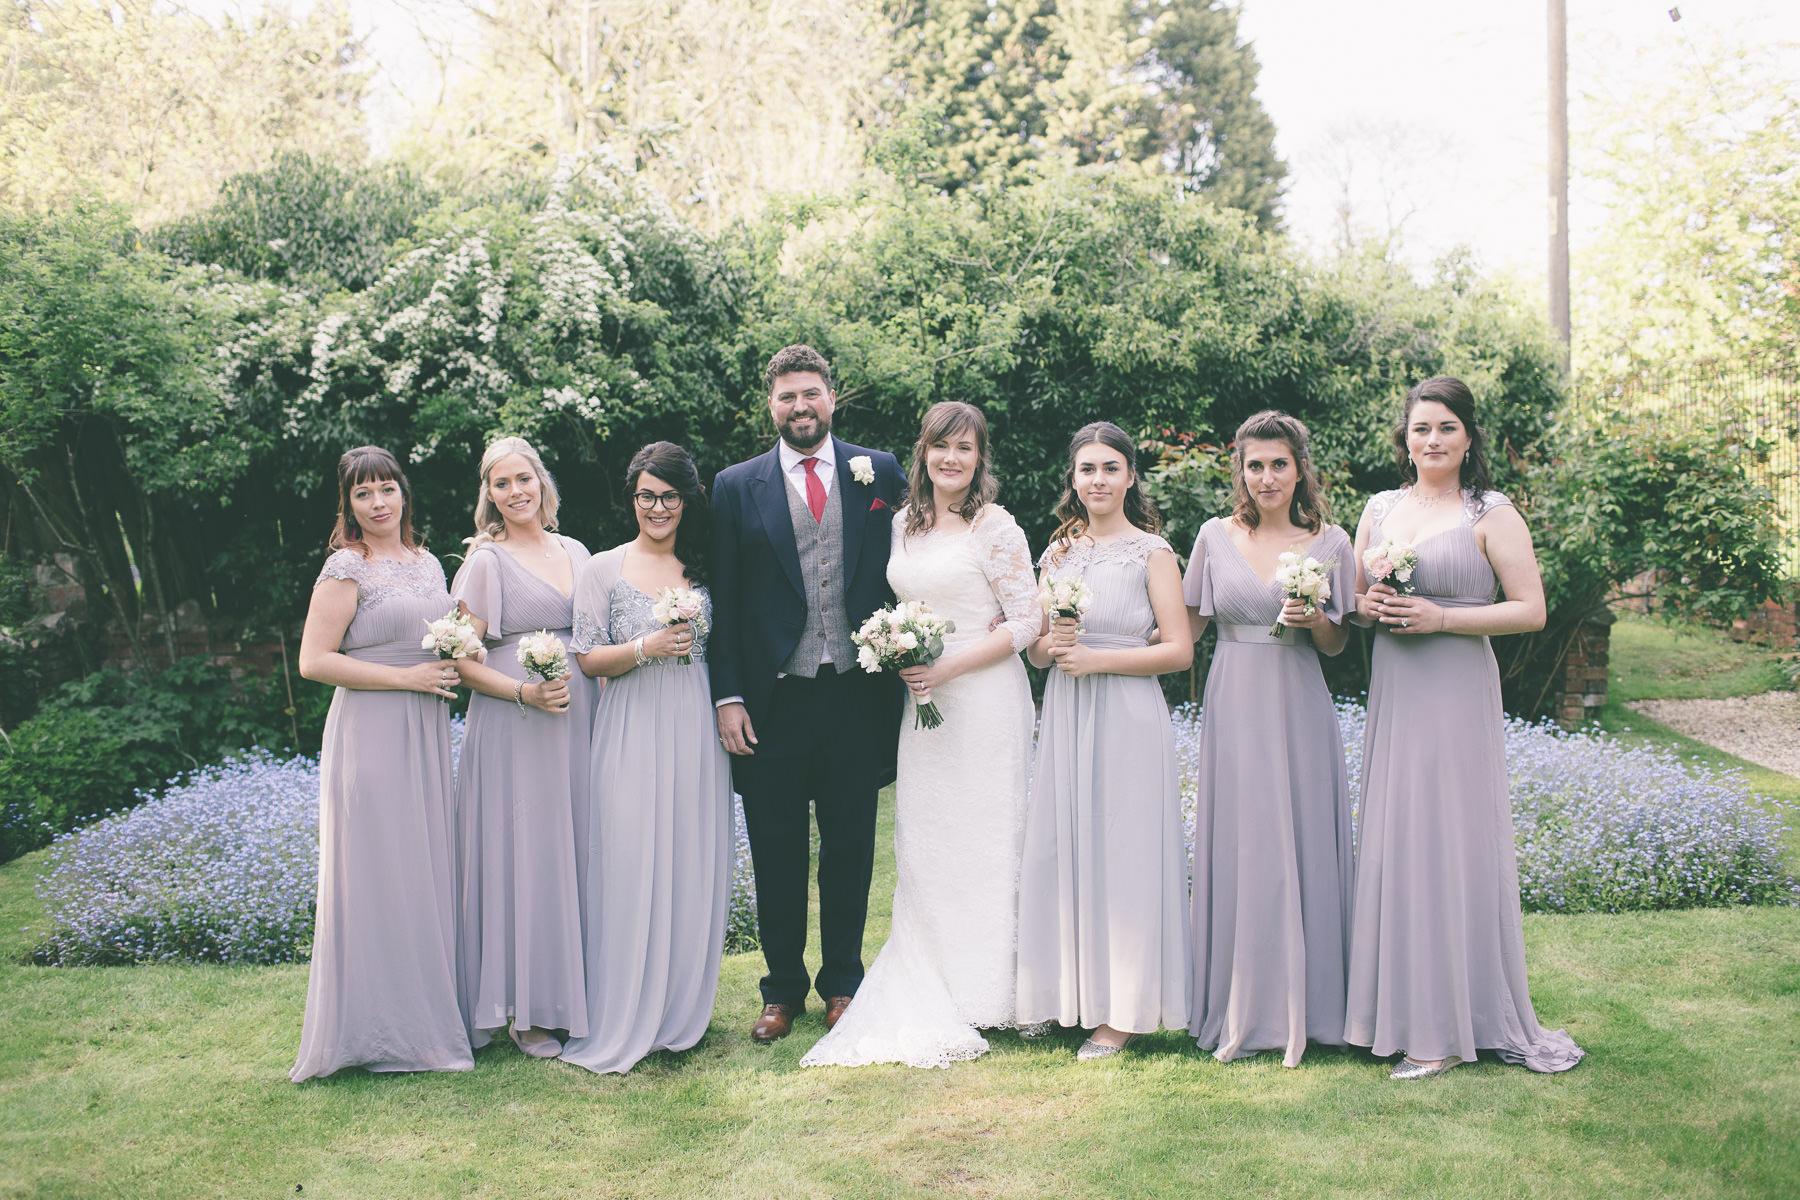 Pamber-Place-wedding-photography-basingstoke-hampshire-179